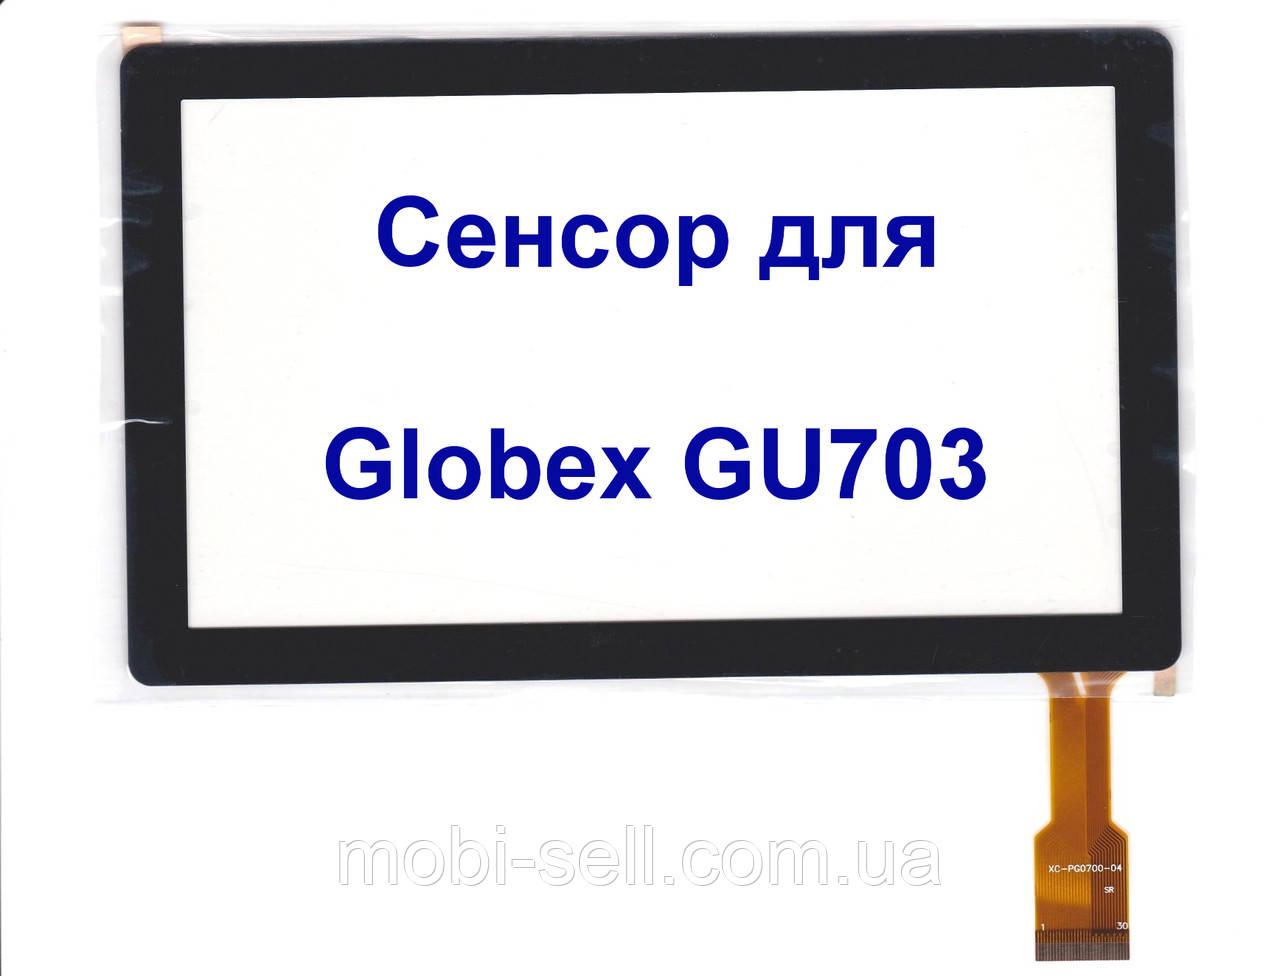 Сенсорний екран для планшета Globex GU703 / GU703c